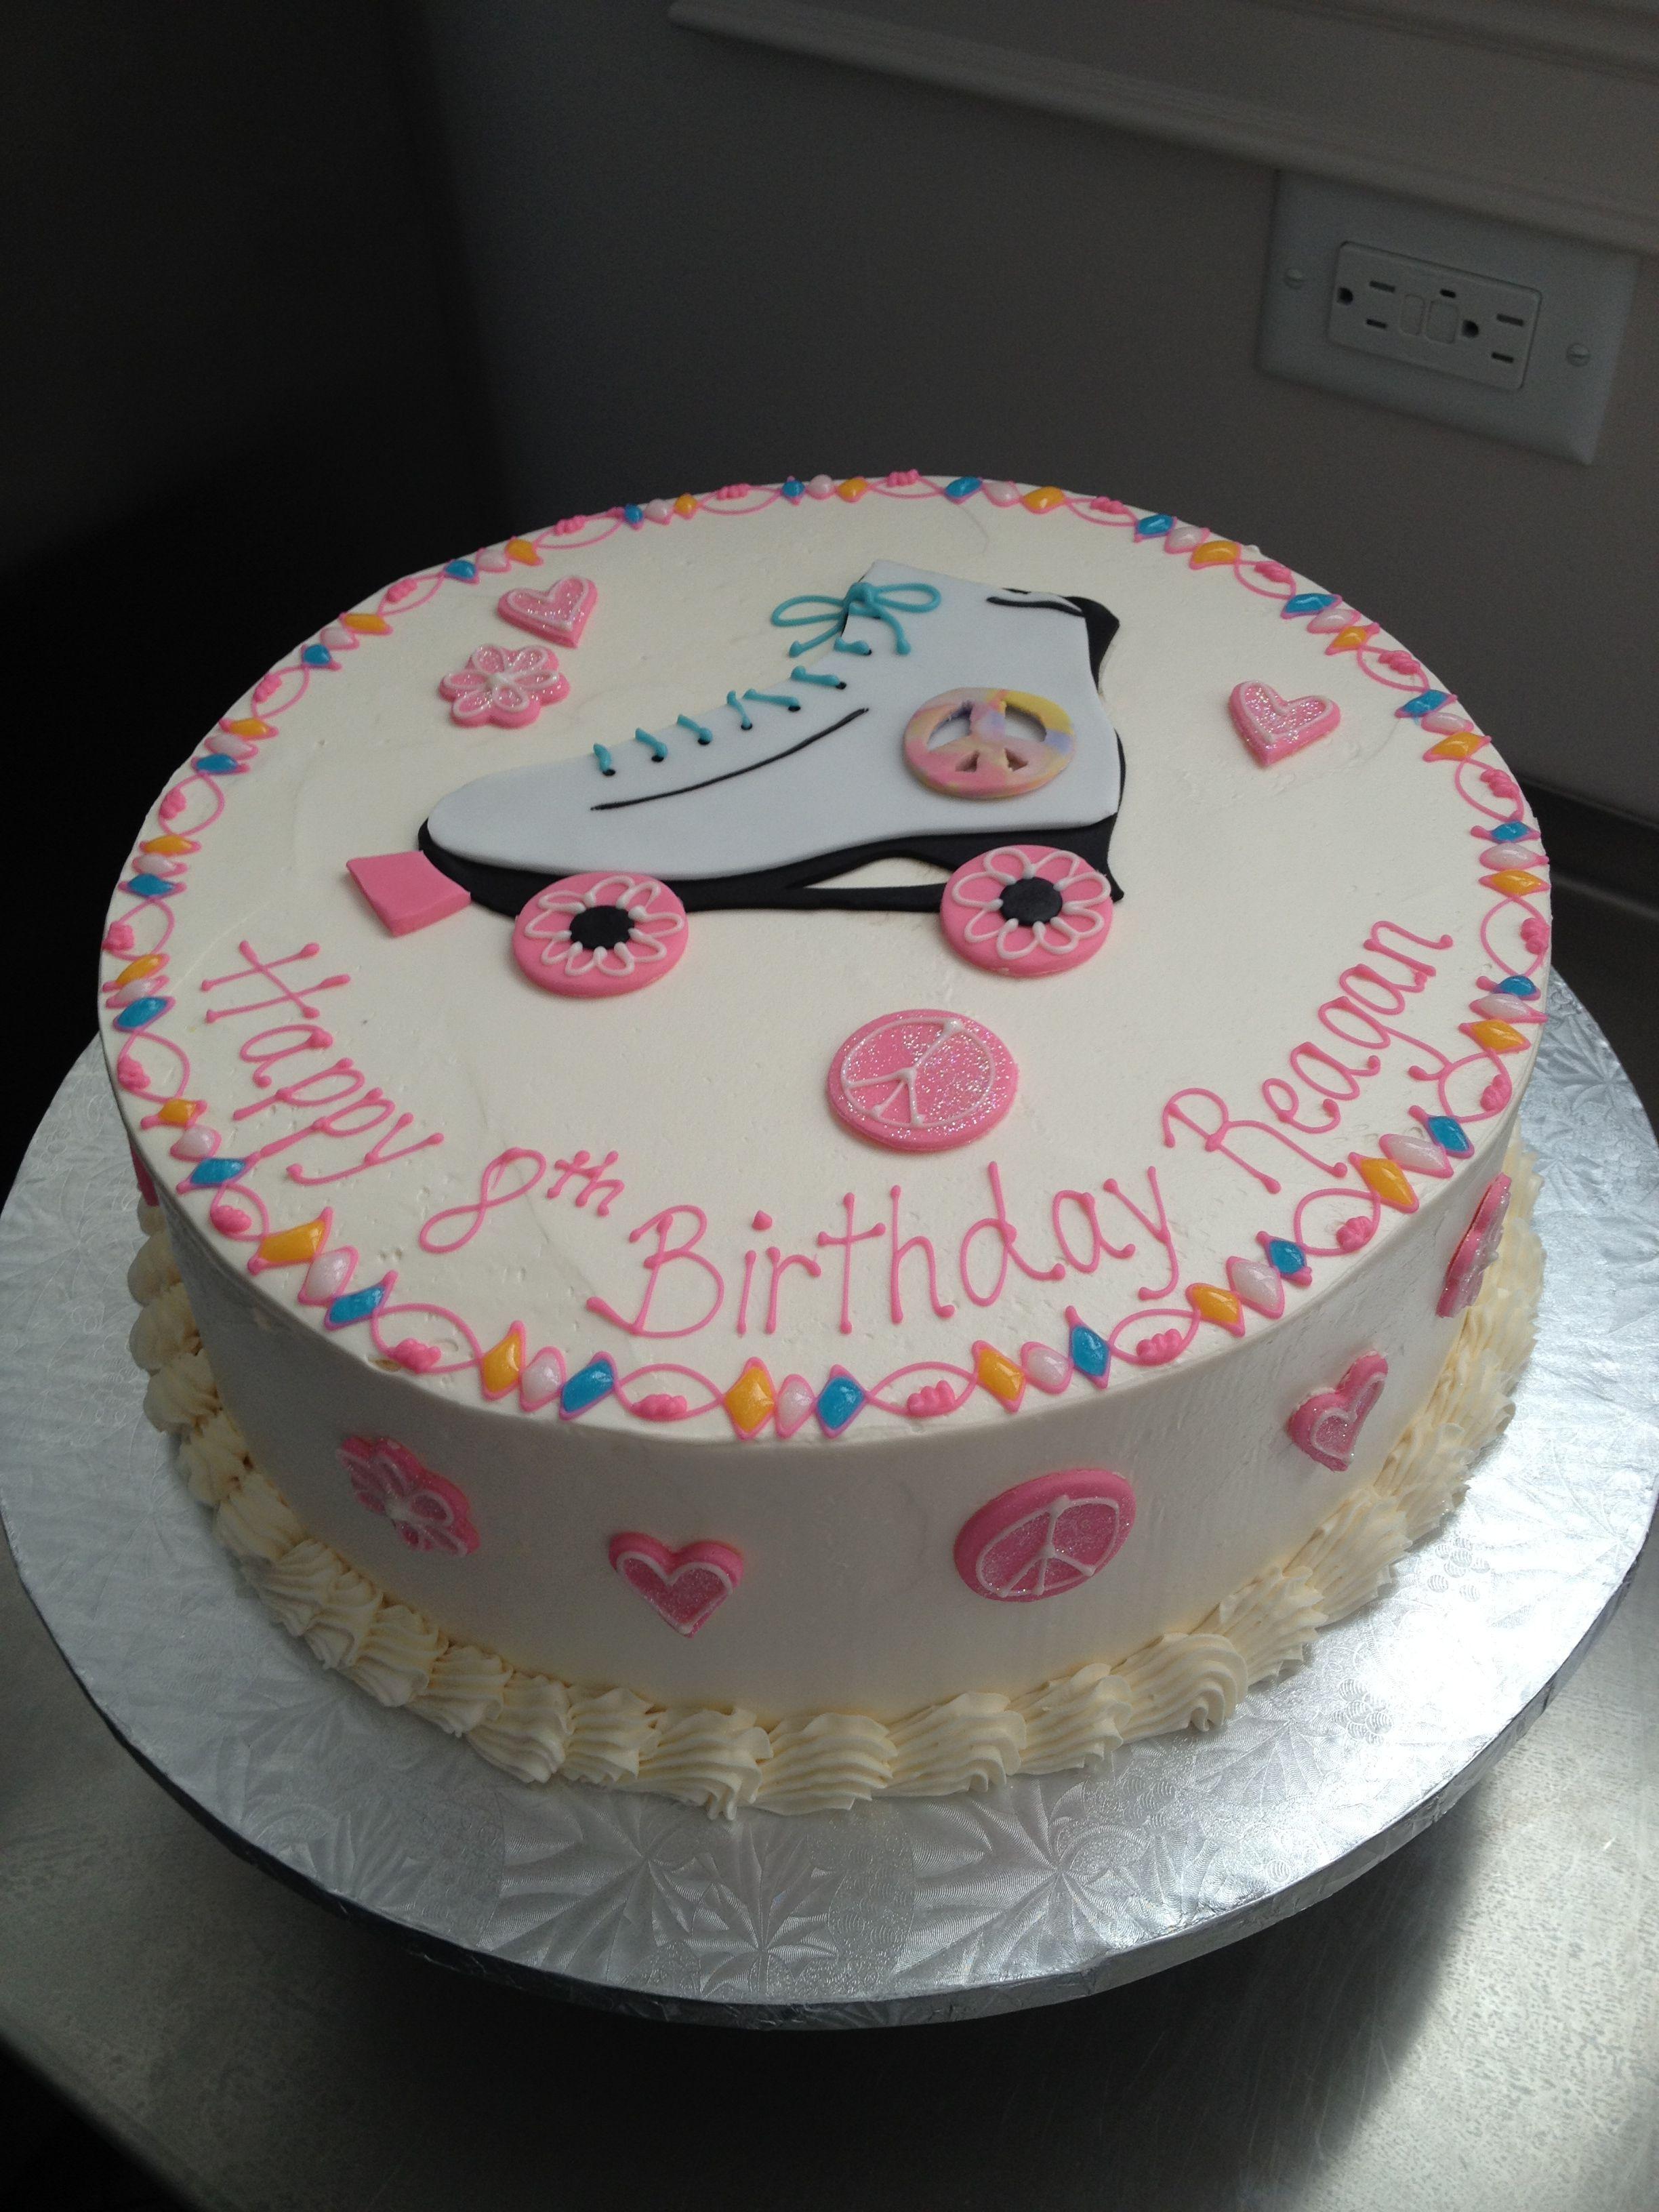 Mini Cheesecake Recipes No Bake Parties